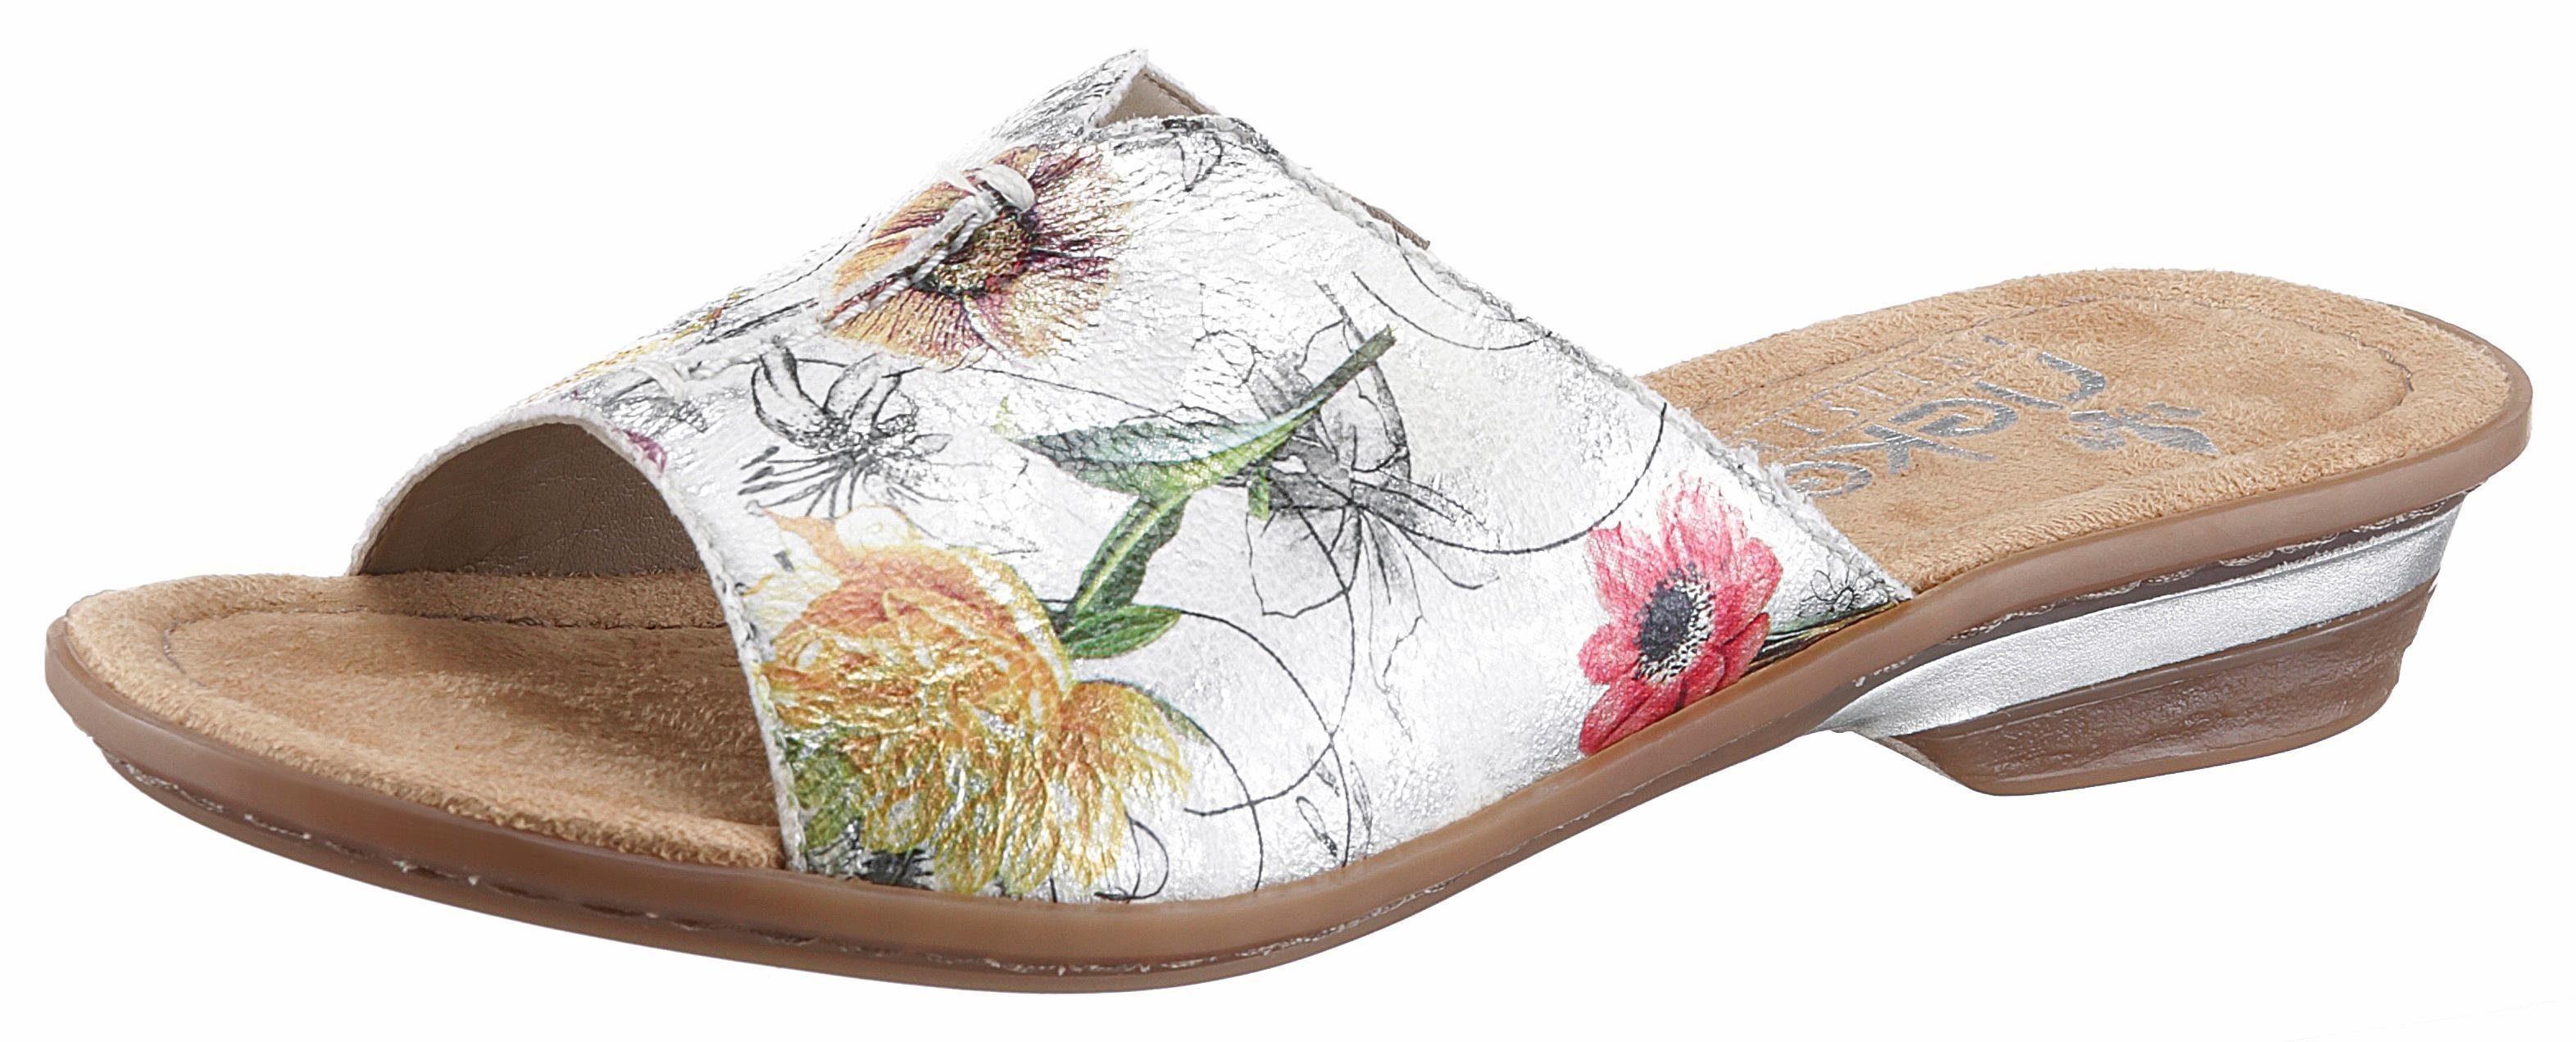 Rieker Pantolette, mit frühlingshaftem Blumenprint  ice-multi